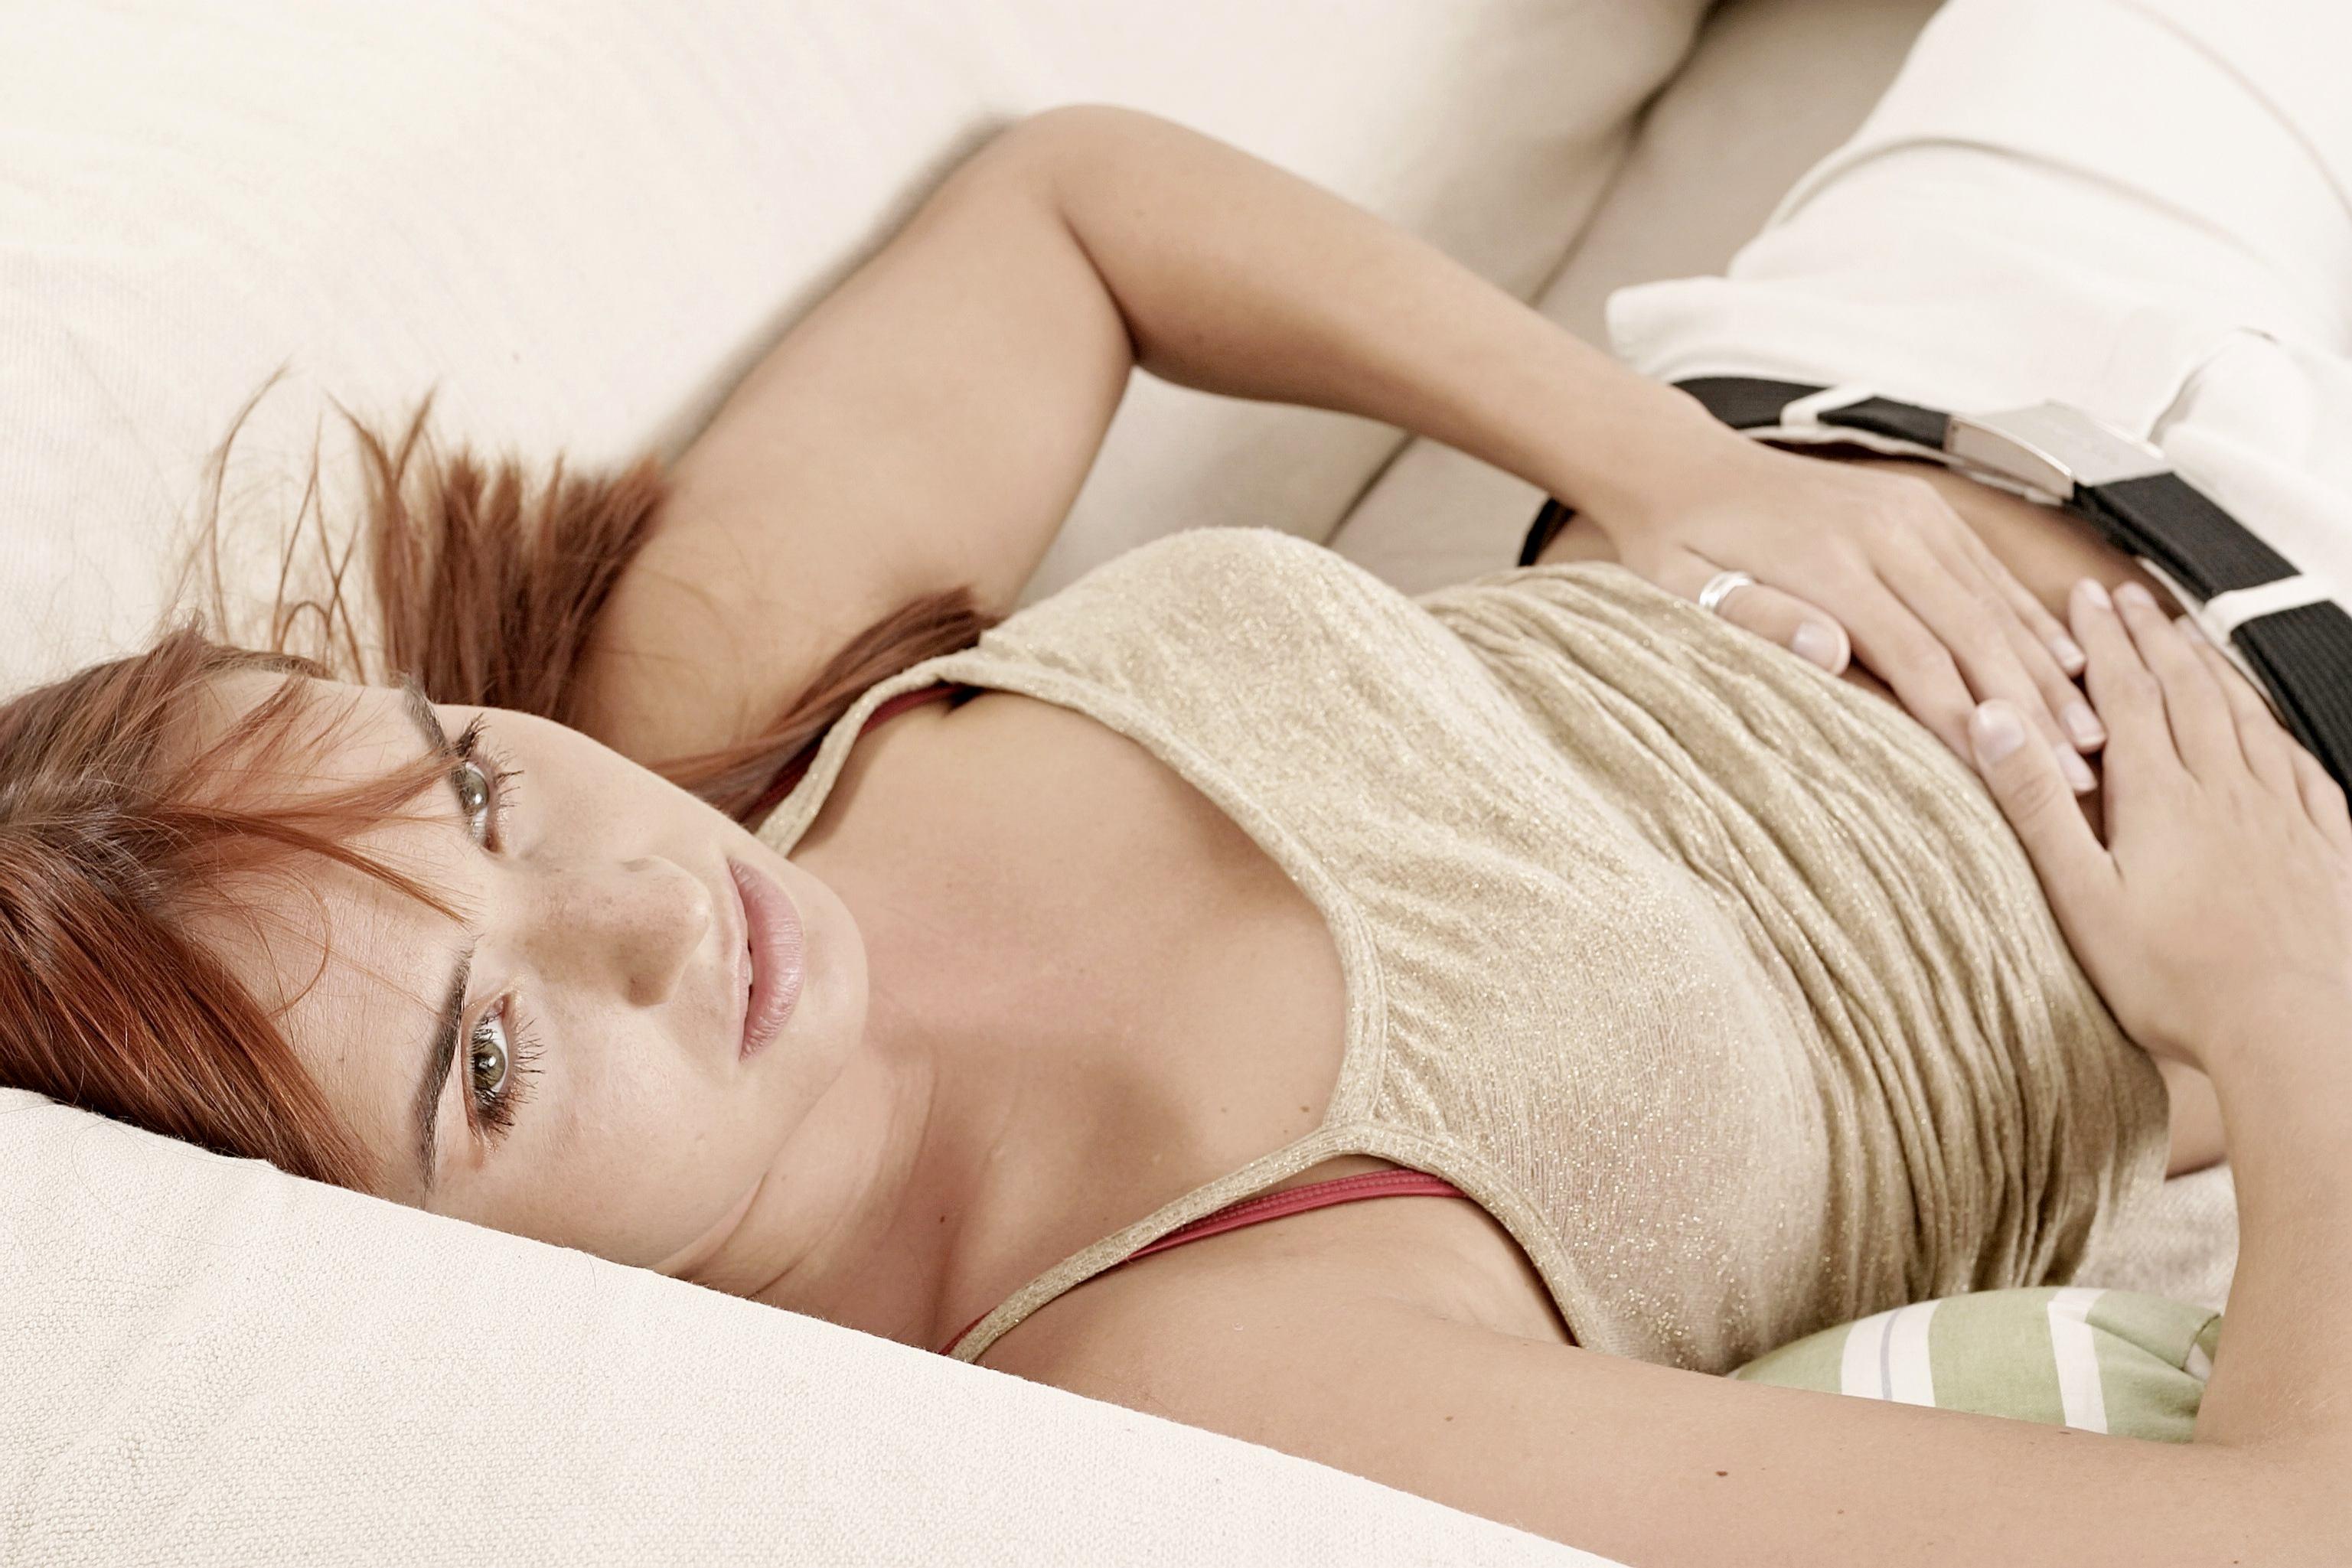 Судороги и схватки при оргазме